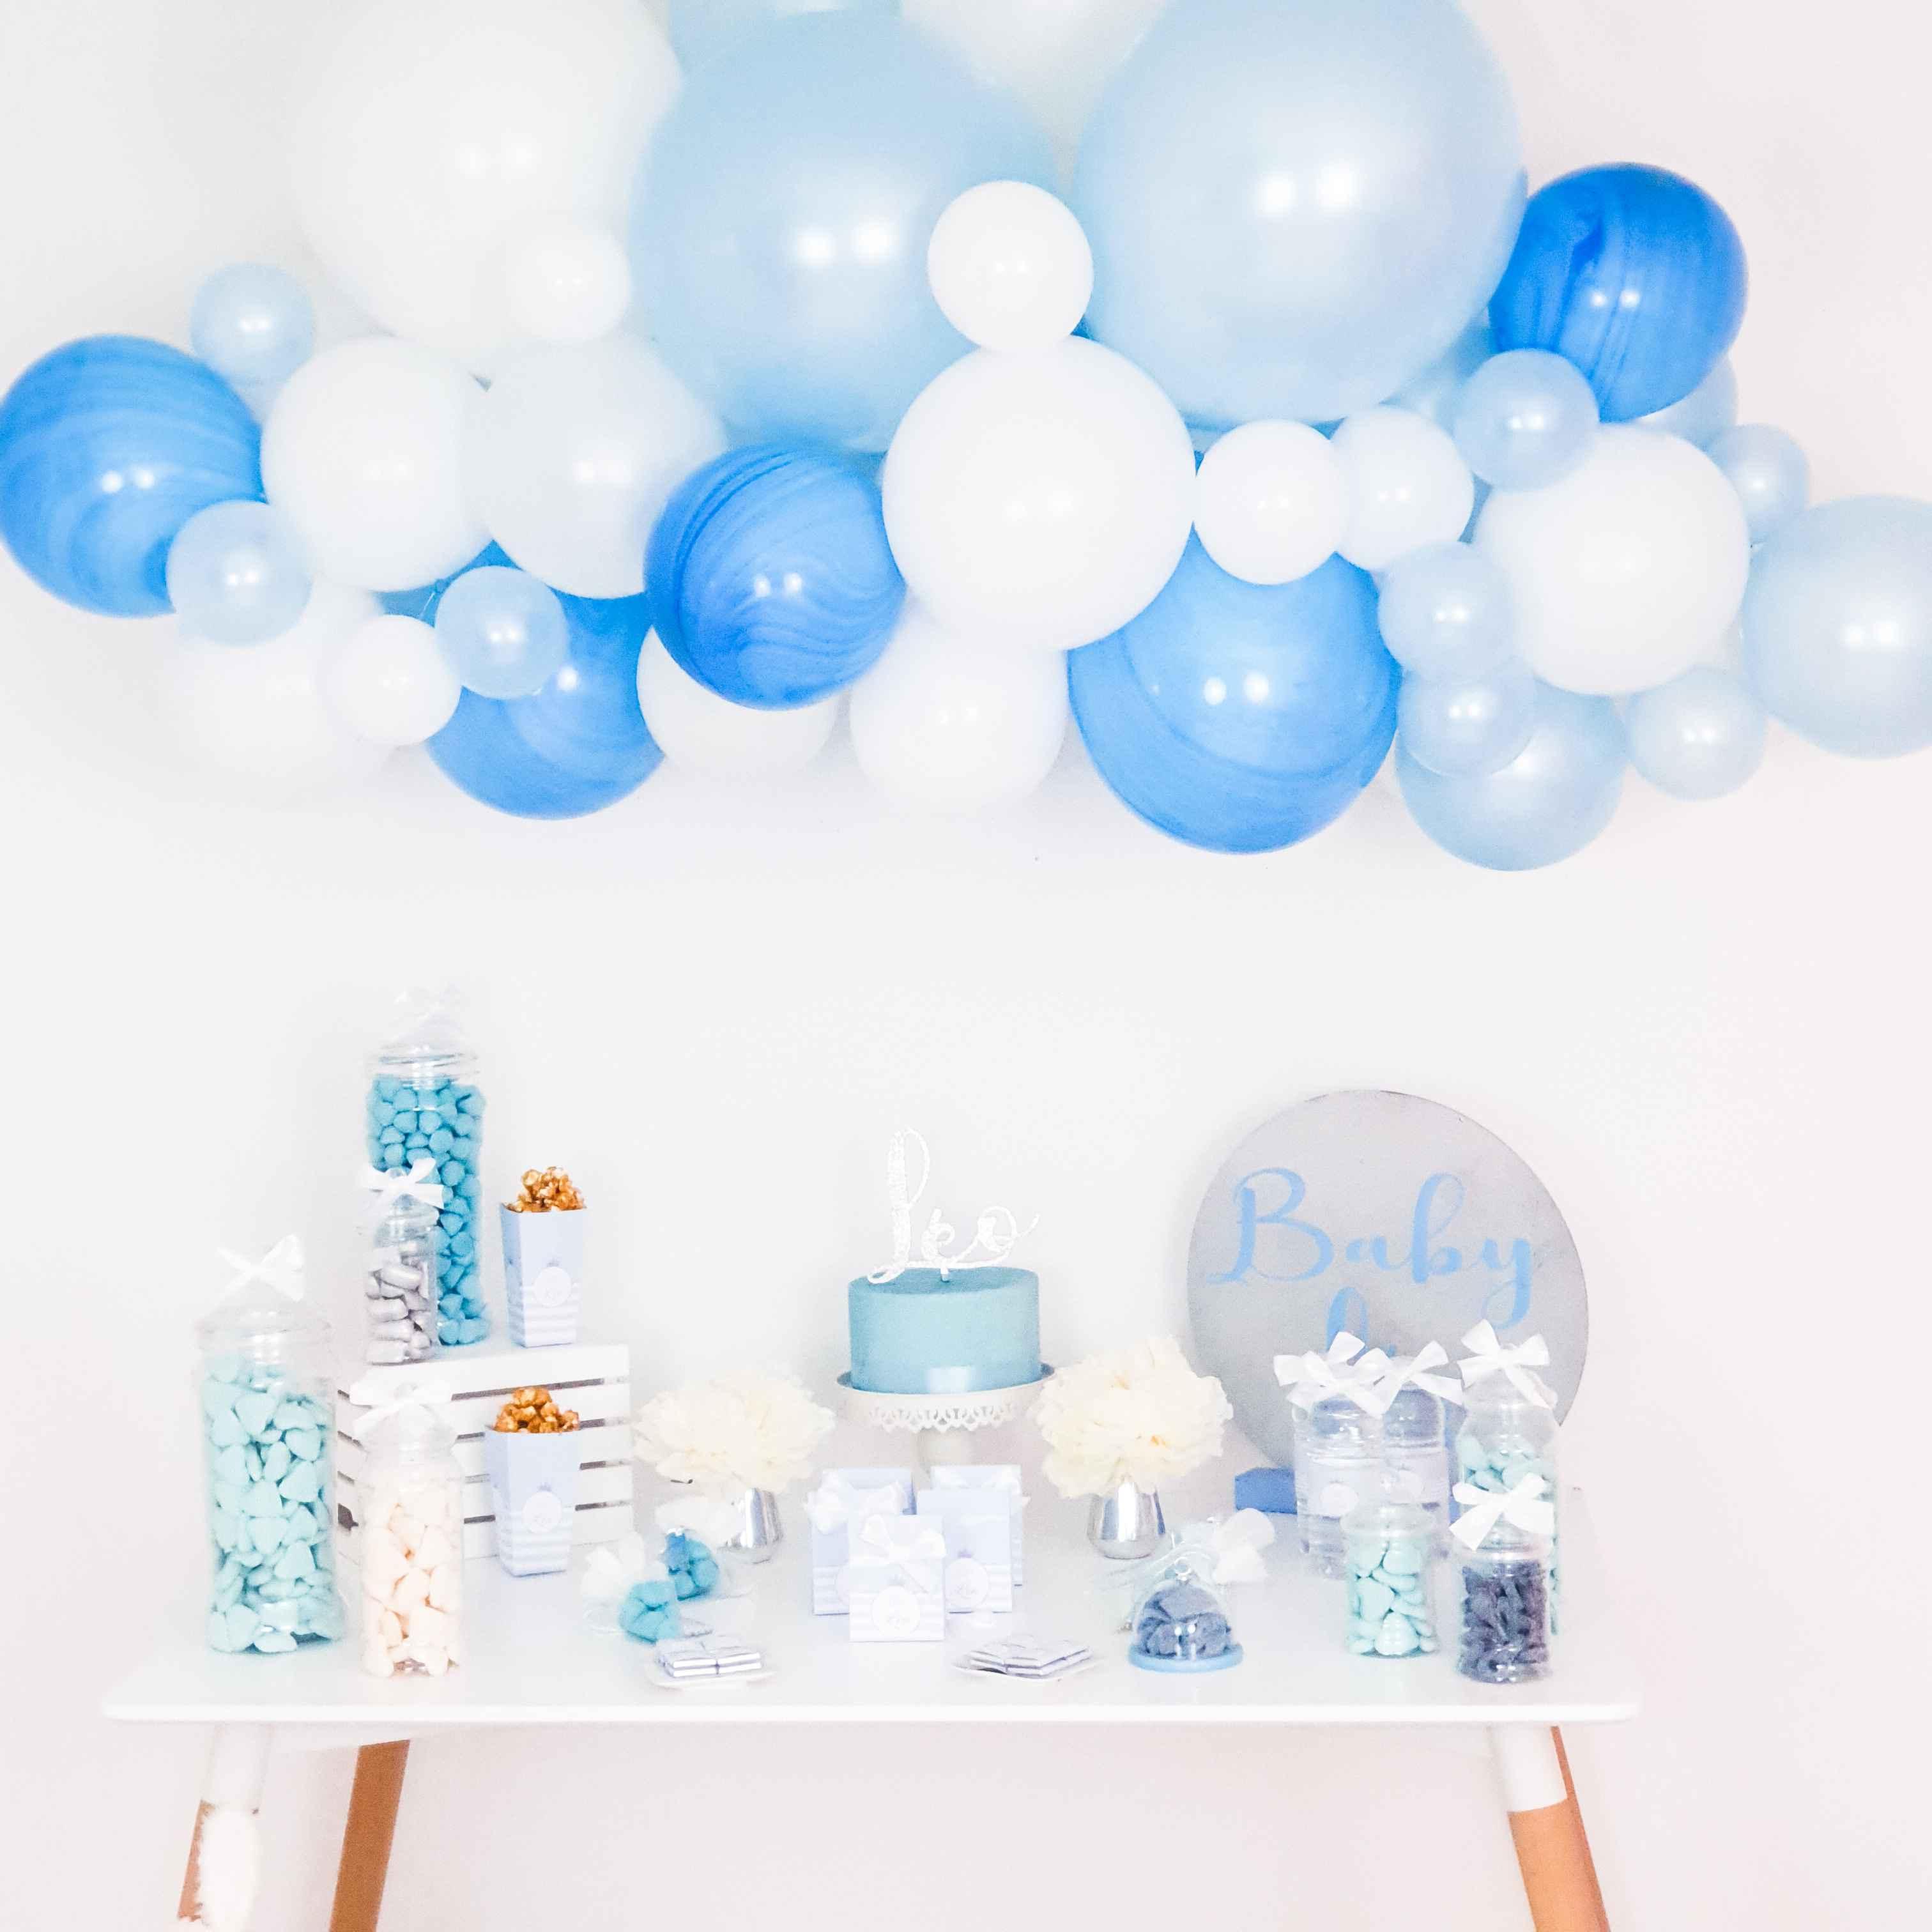 Baptême bleu éléphant invitations 8pk fête décoration garçons